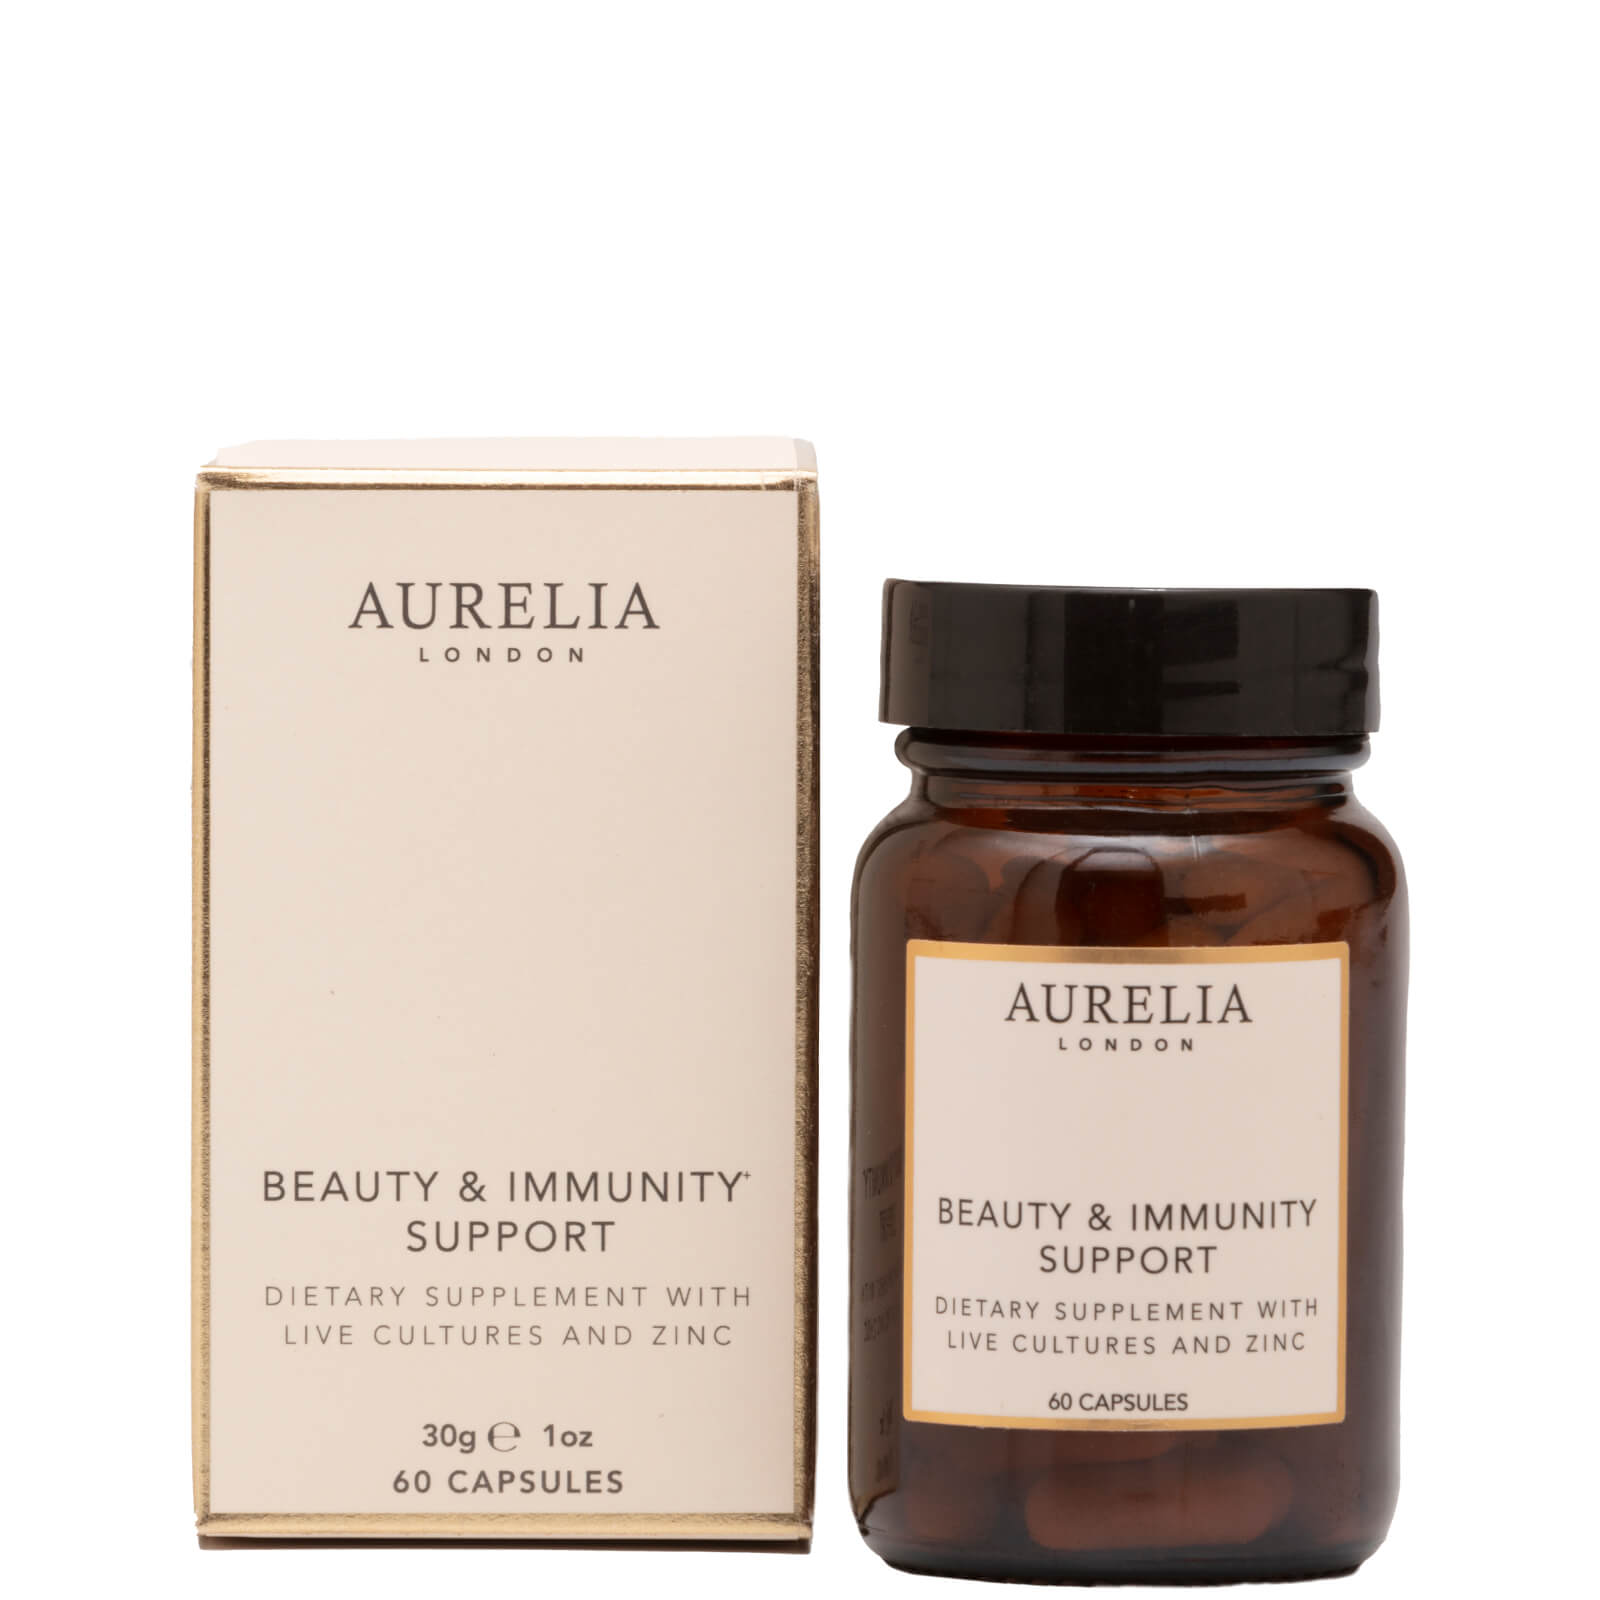 Aurelia Probiotic Skincare Beauty and Immunity Support Supplements (60 Capsules)